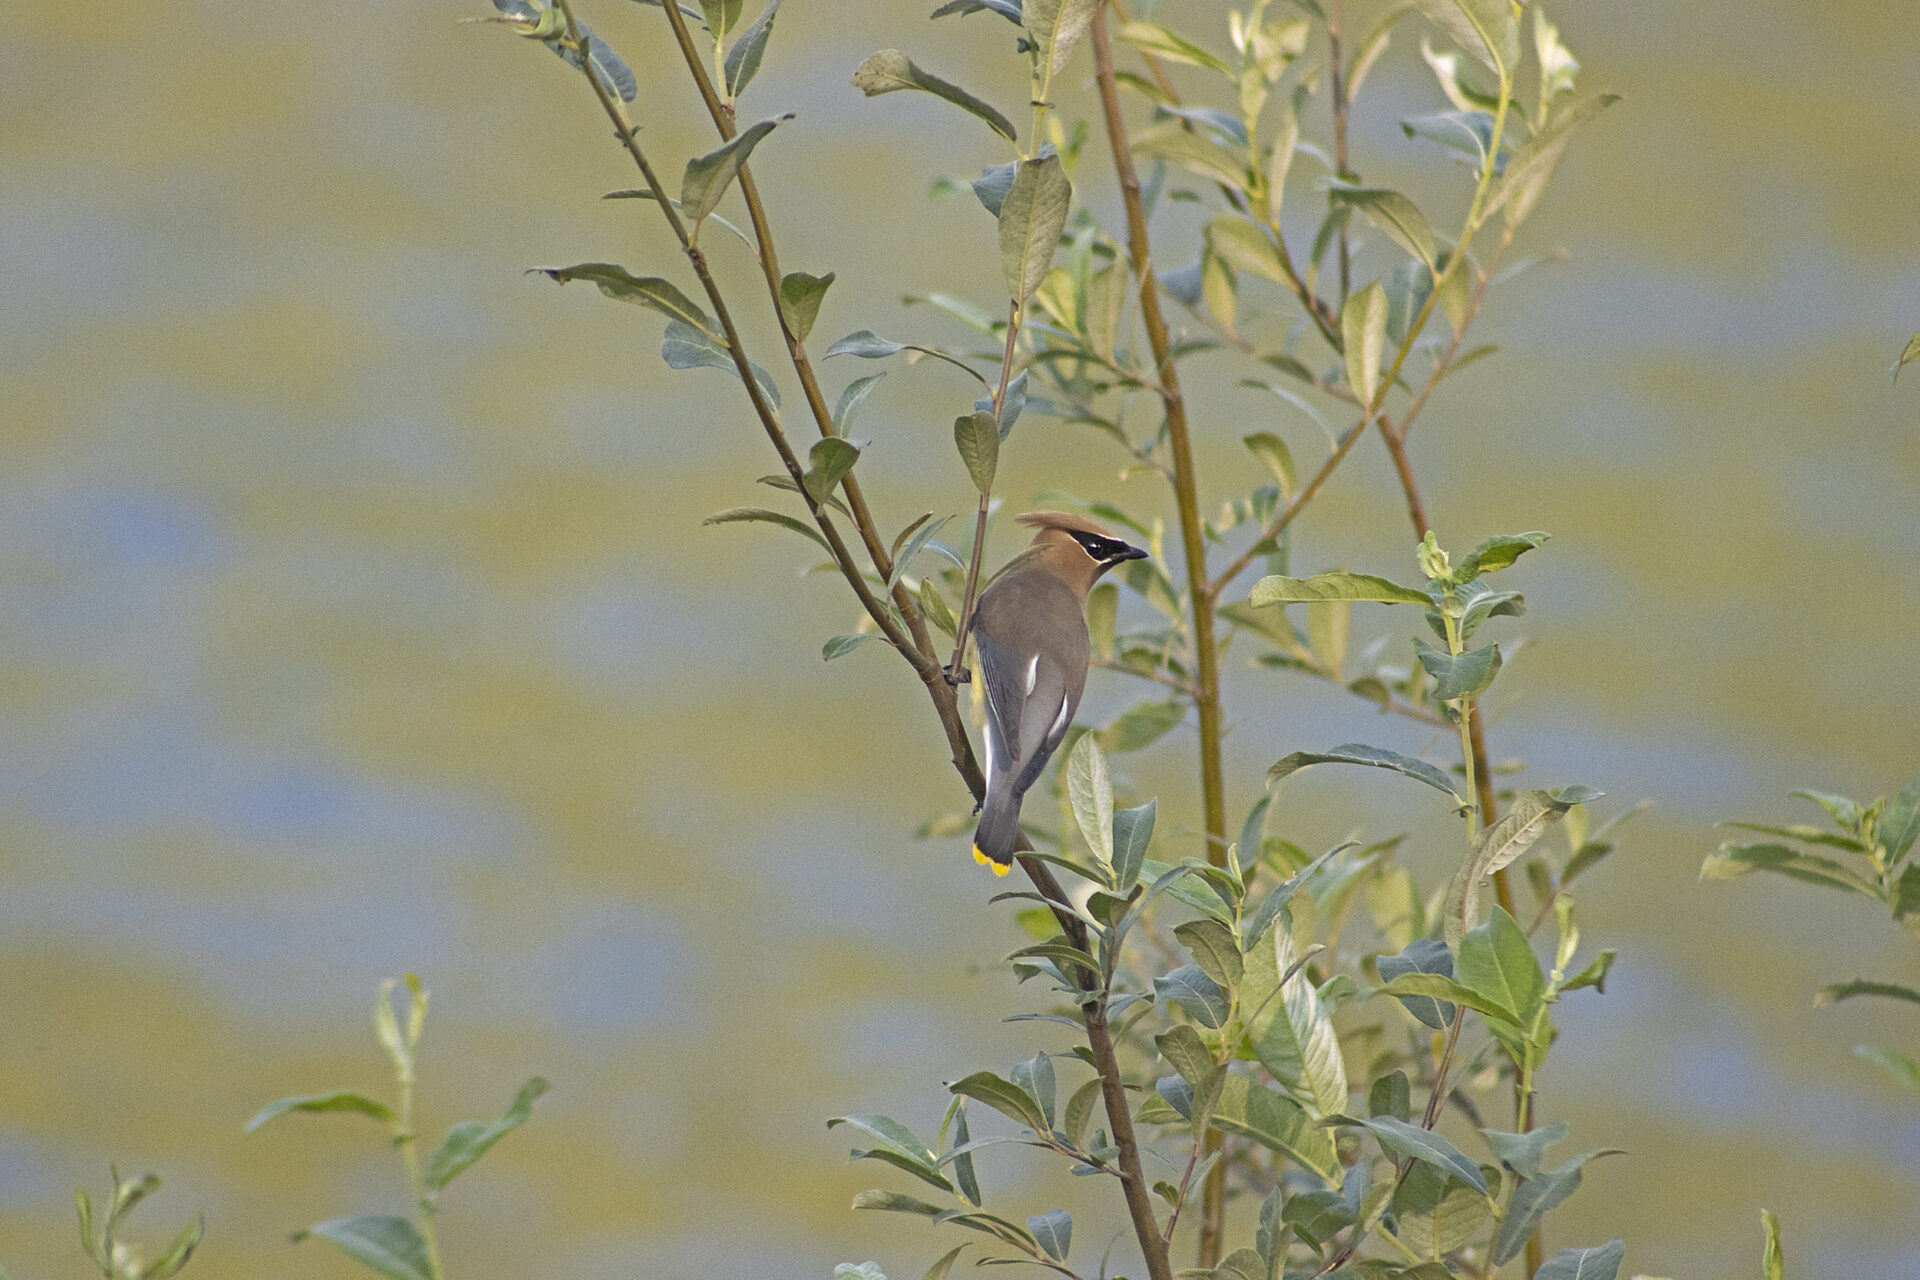 Cedar Waxwing in Tree at Chehalis Lake, July 9, 2021